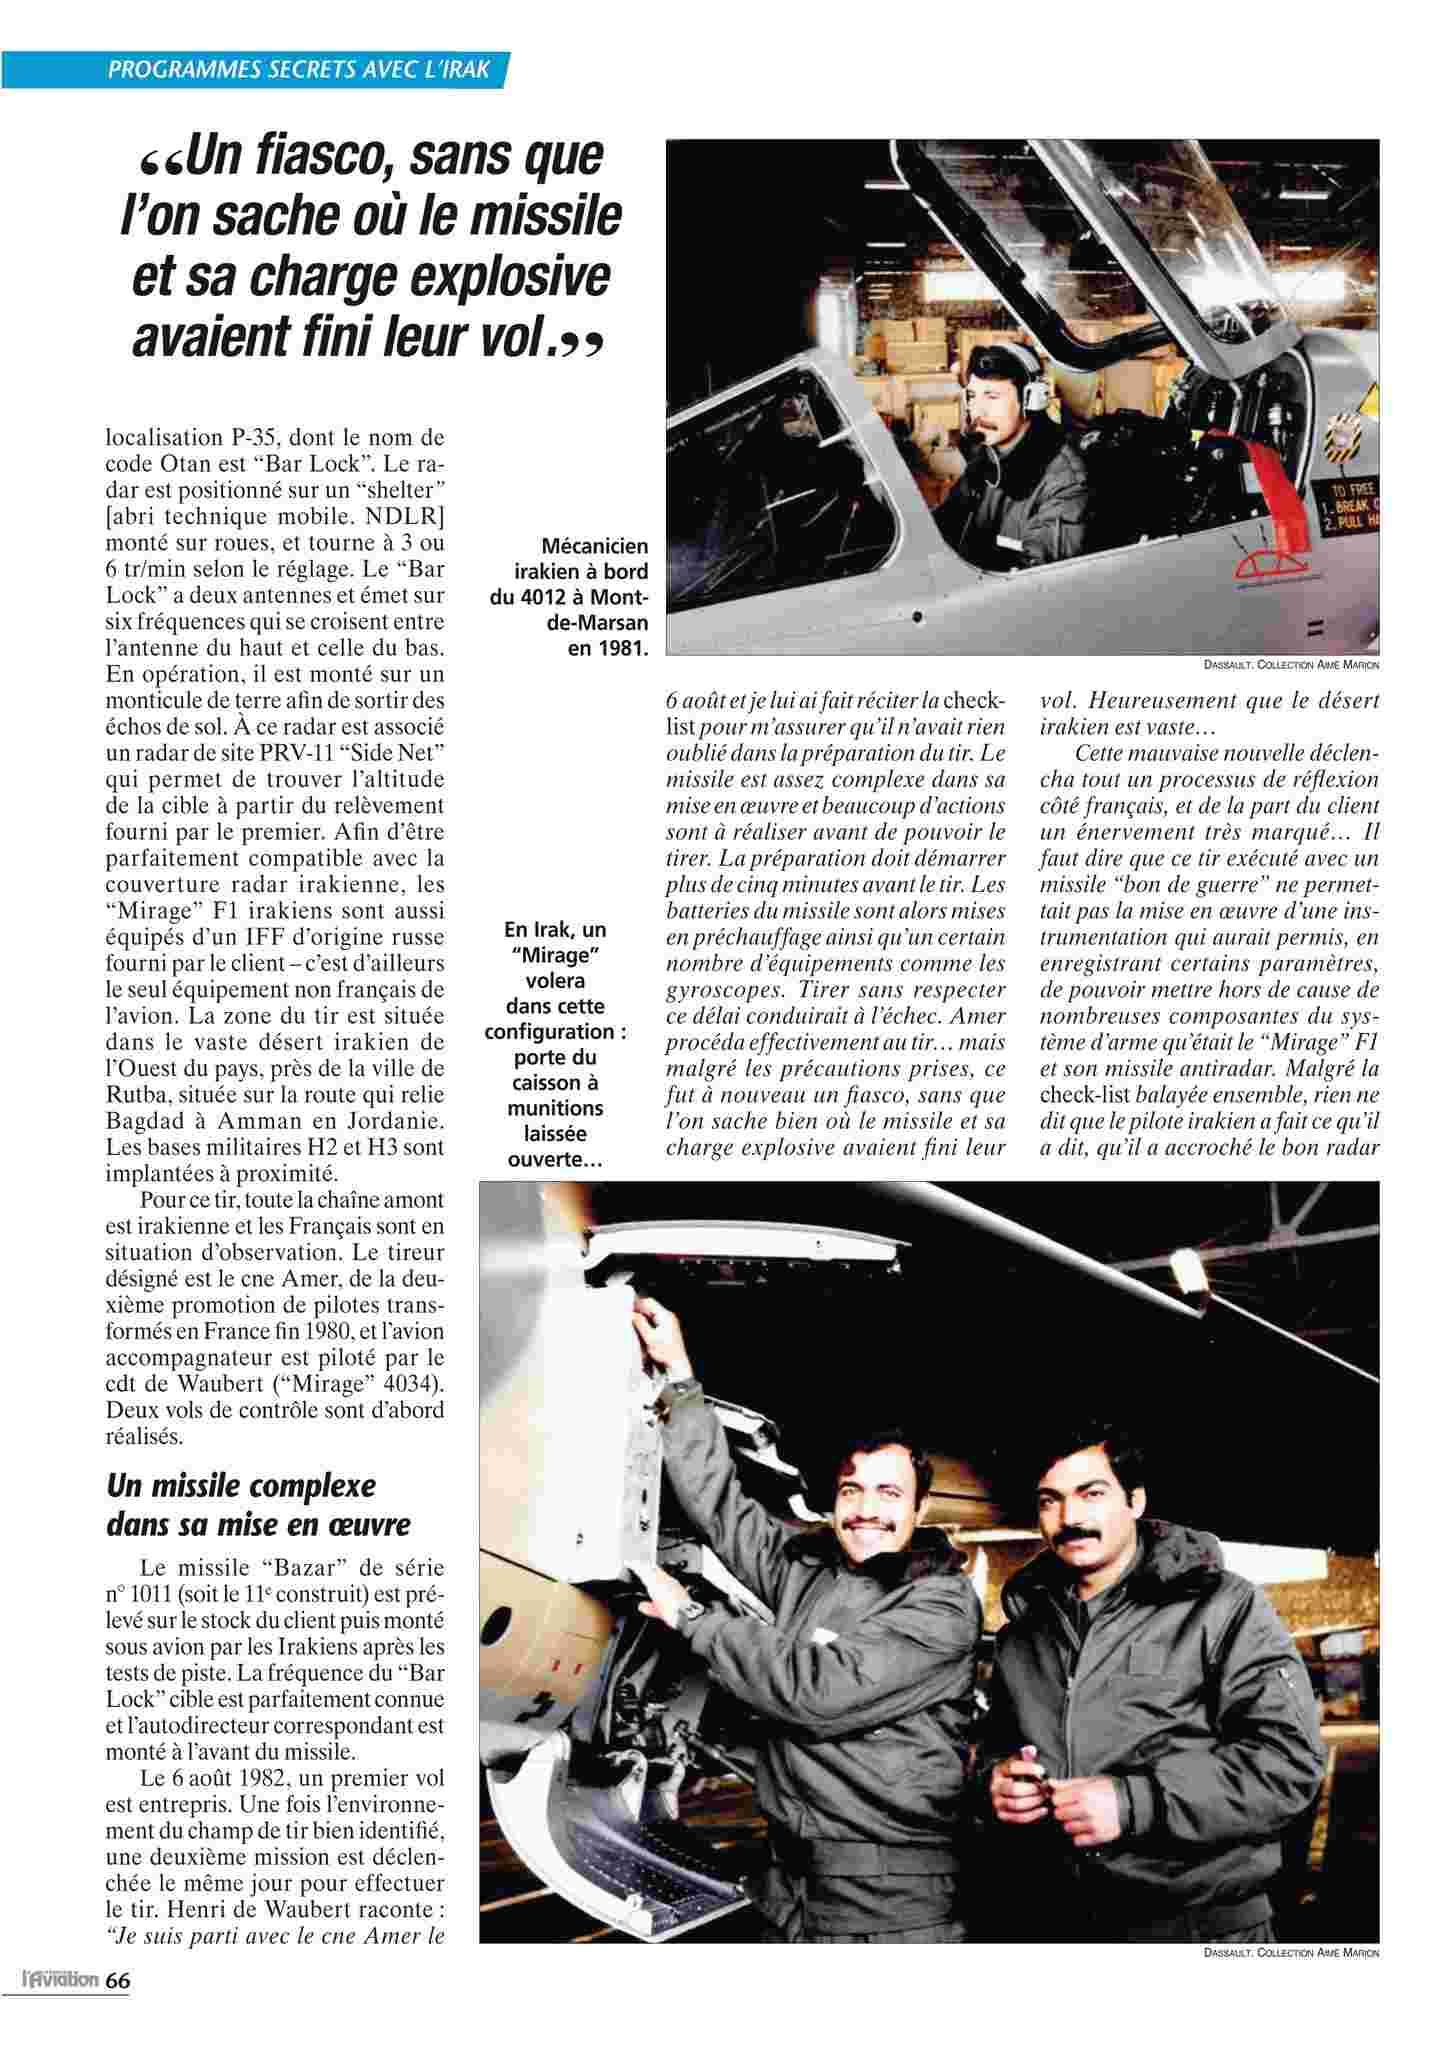 Guerre Iran-Irak - Page 3 A02210